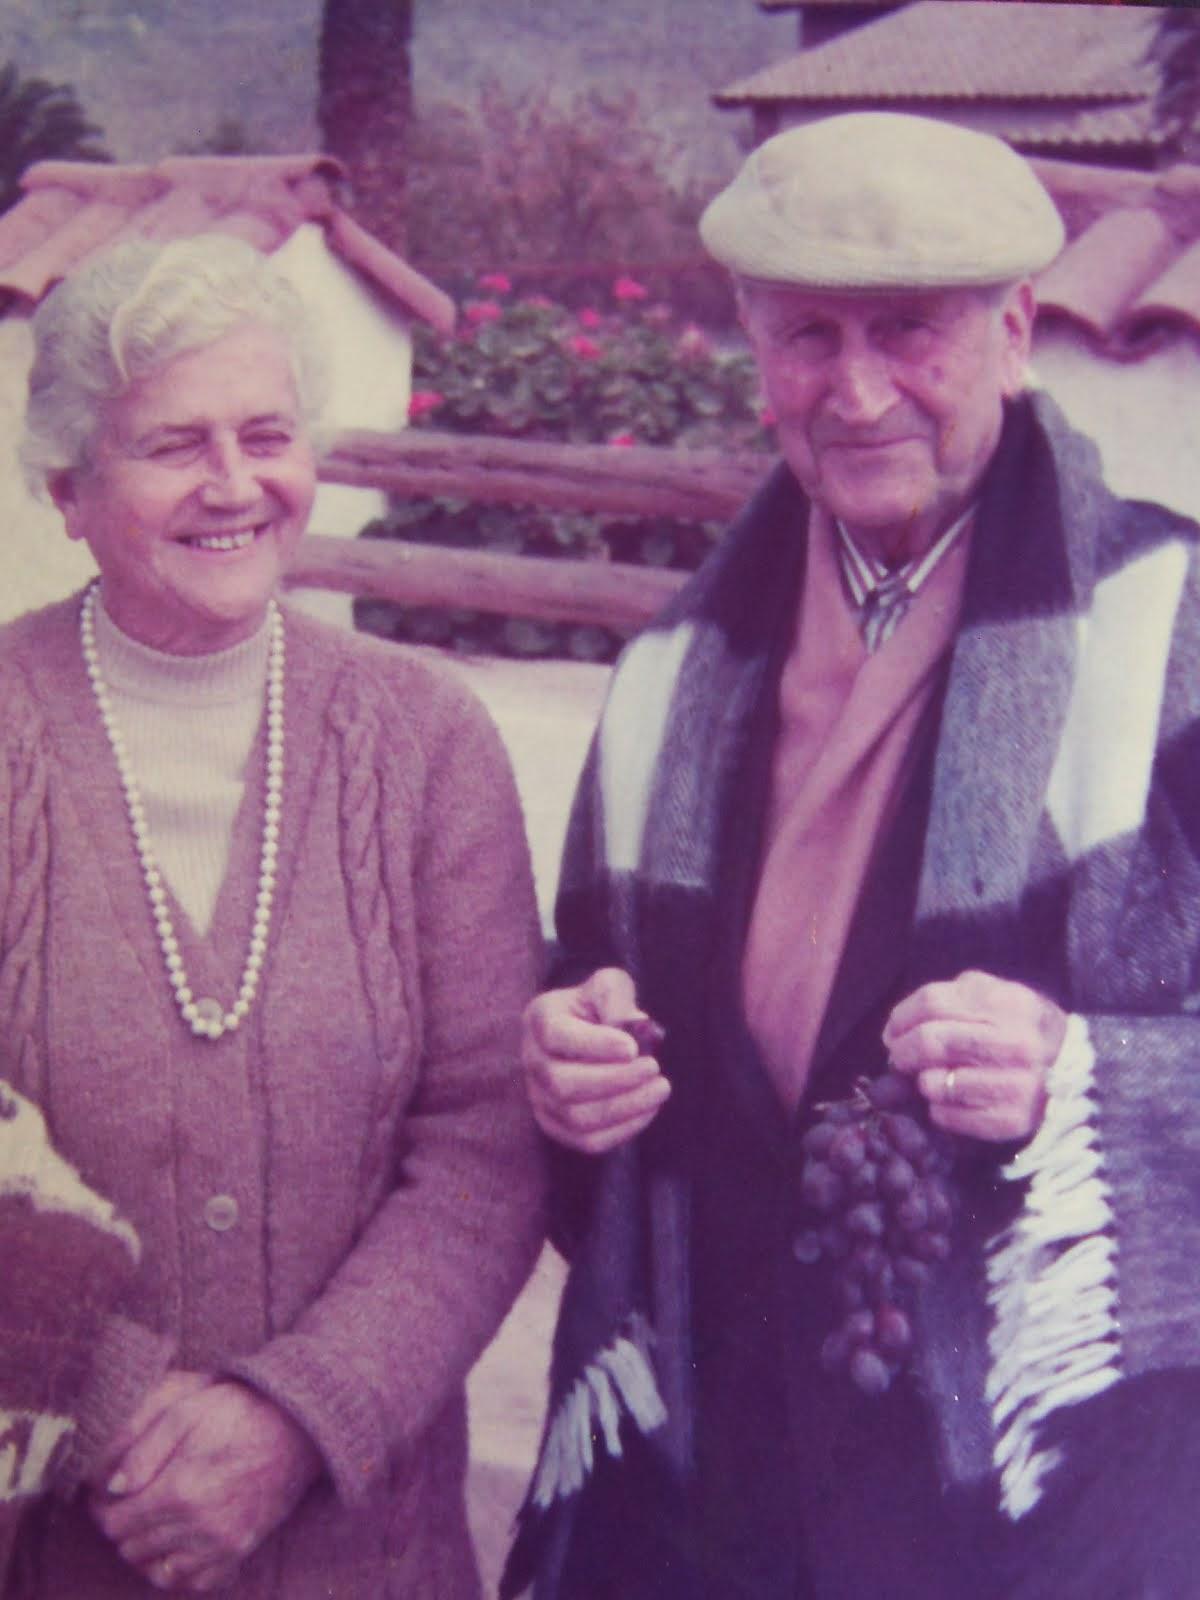 Mis padres, Horacio e Inés,  inspiradores de mi vida académica.